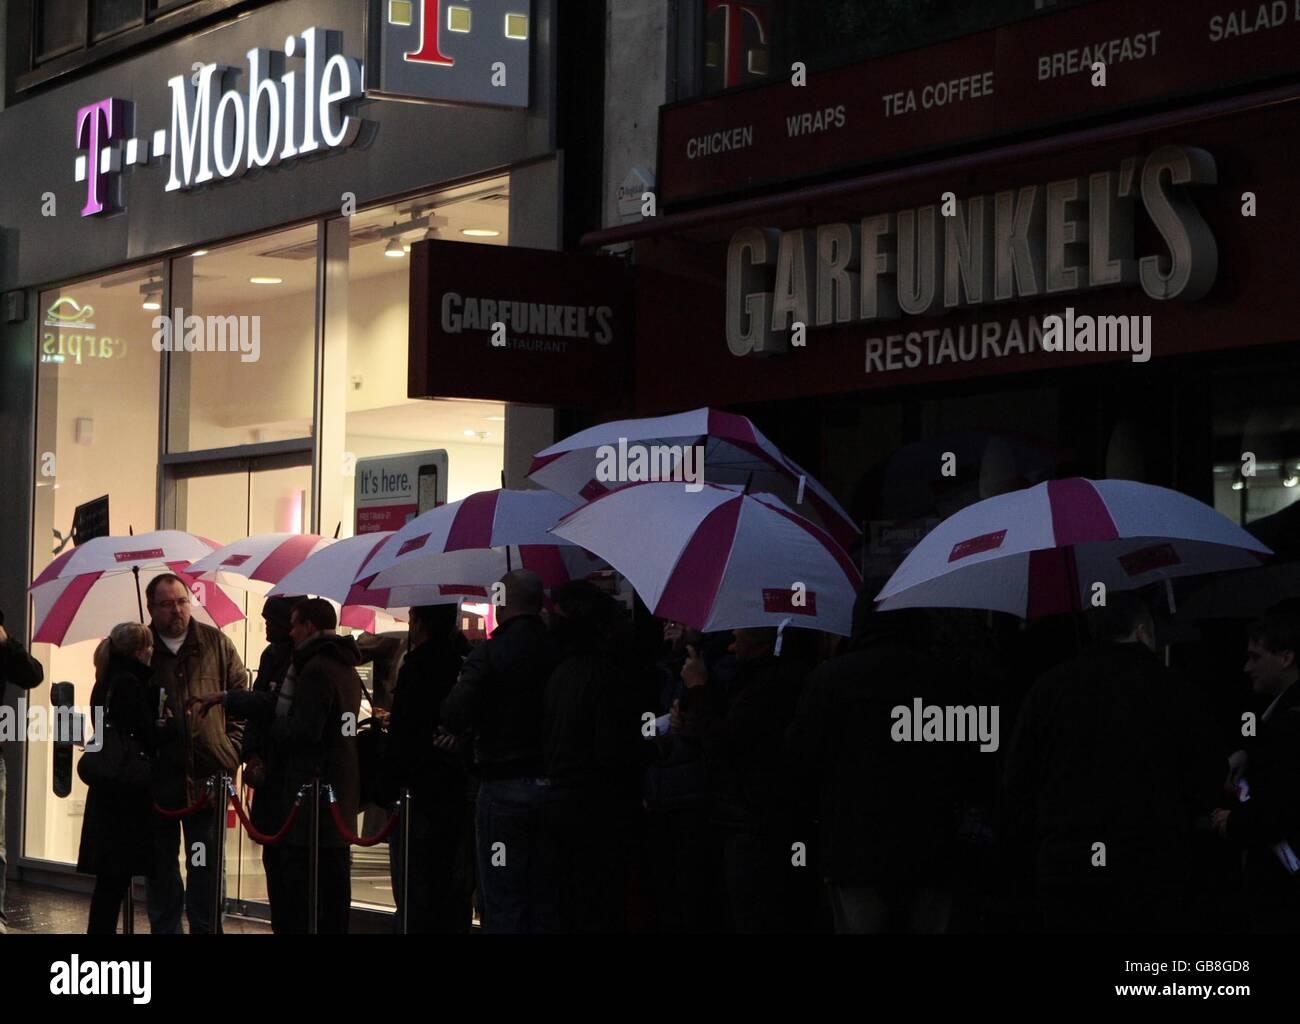 T-Mobile G1 - London - Stock Image